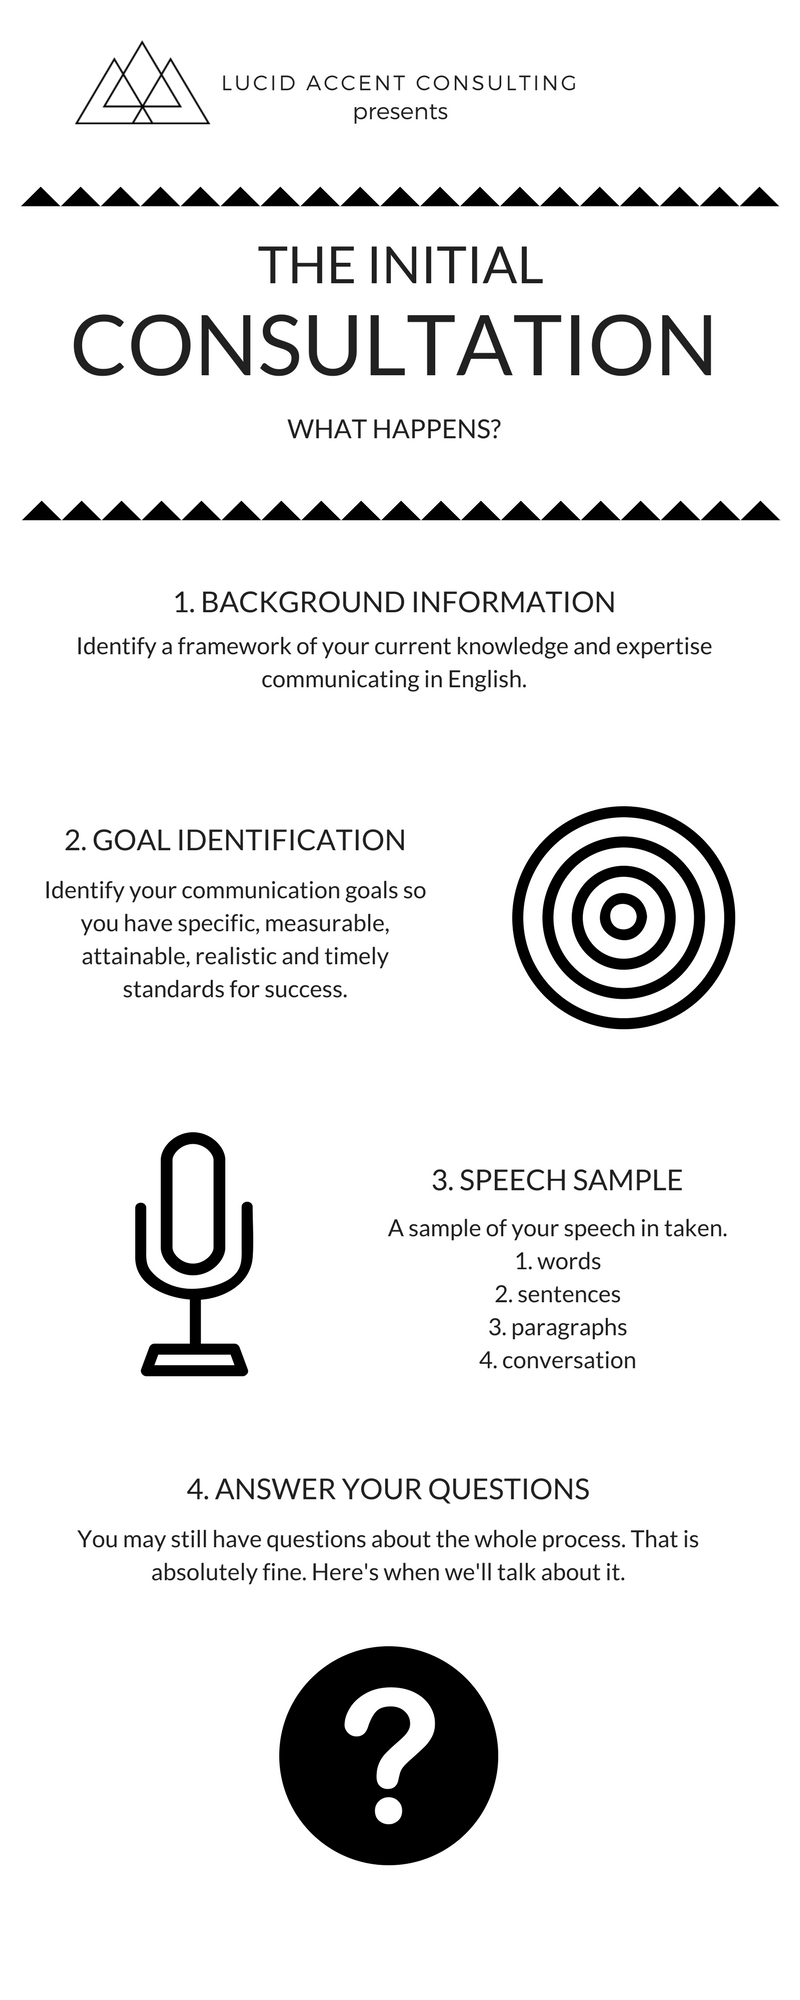 Initial Consultation | Lucid Accent Consulting